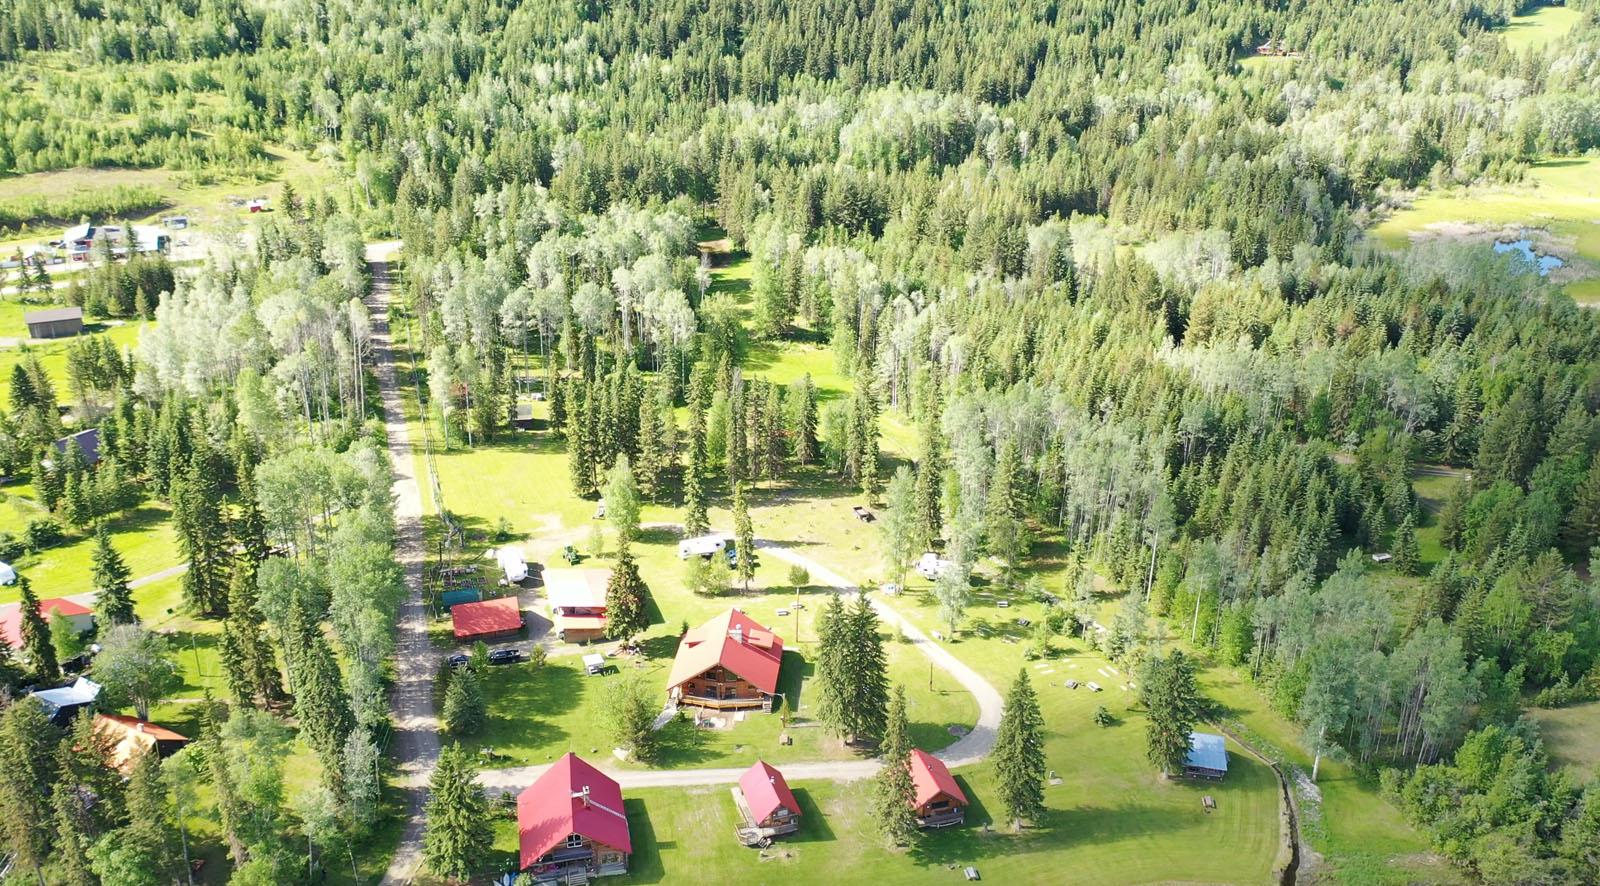 Canim lake resort 04